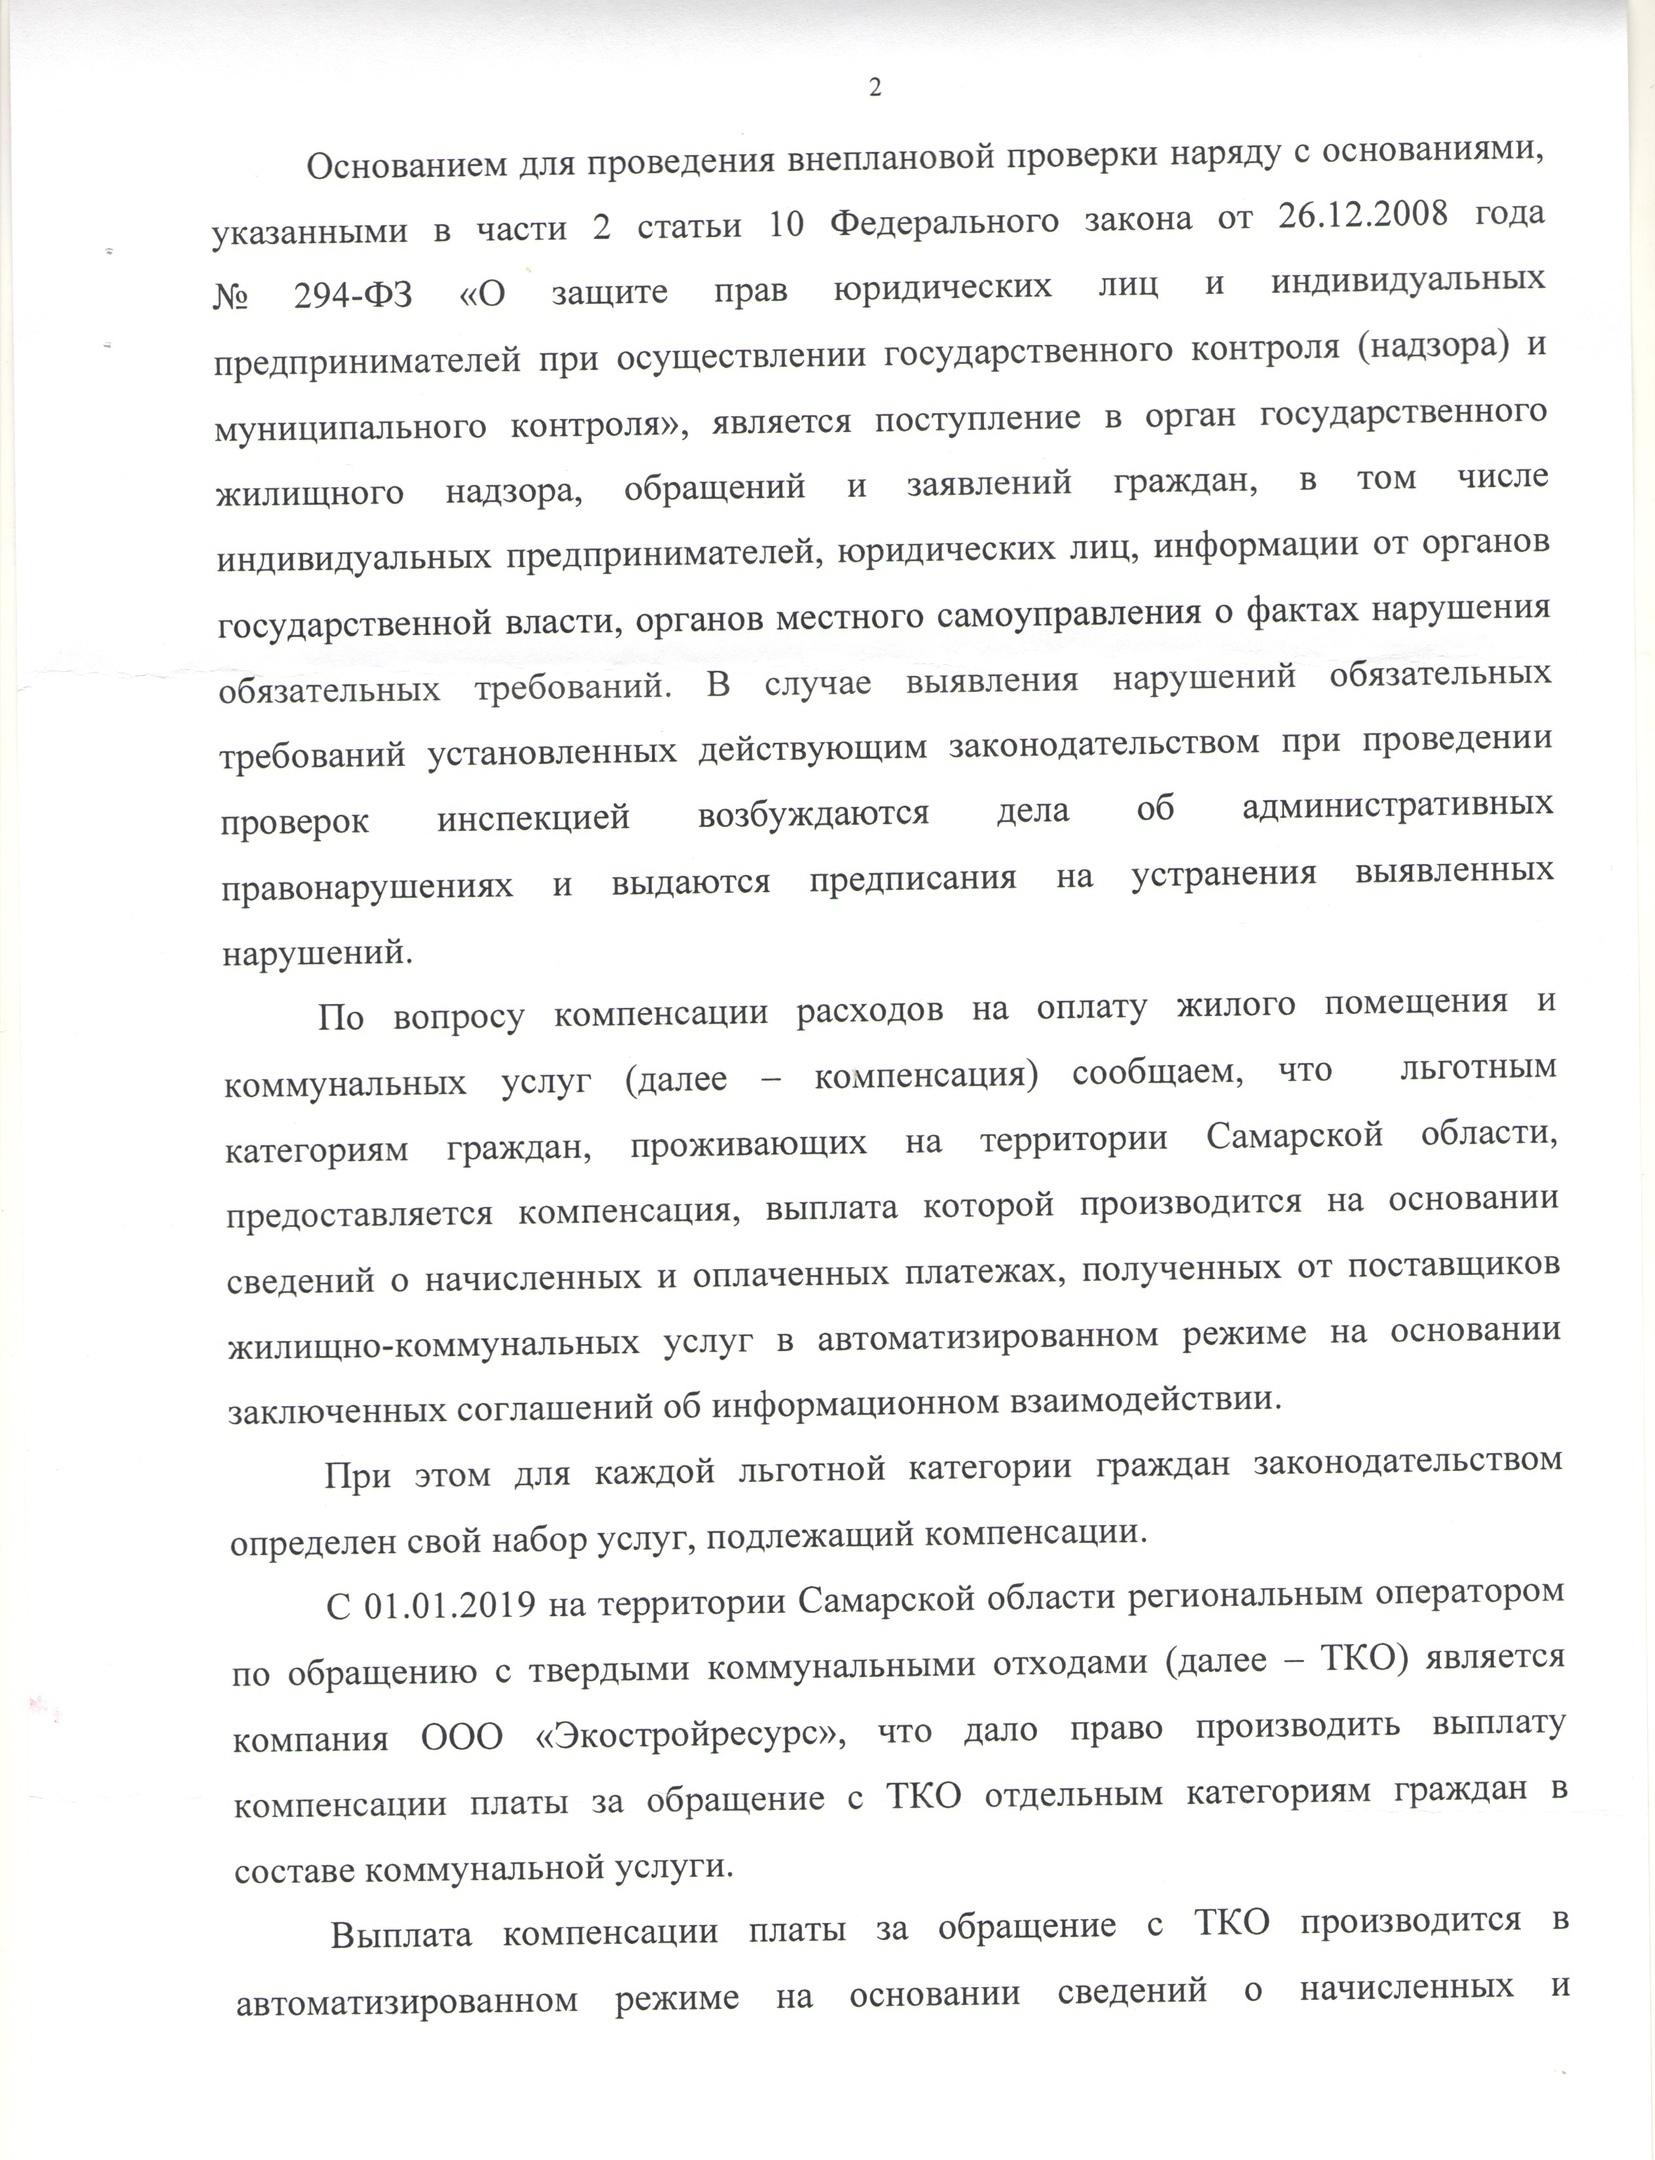 Ответ власти на митинг в Сызрани 02.11.2019